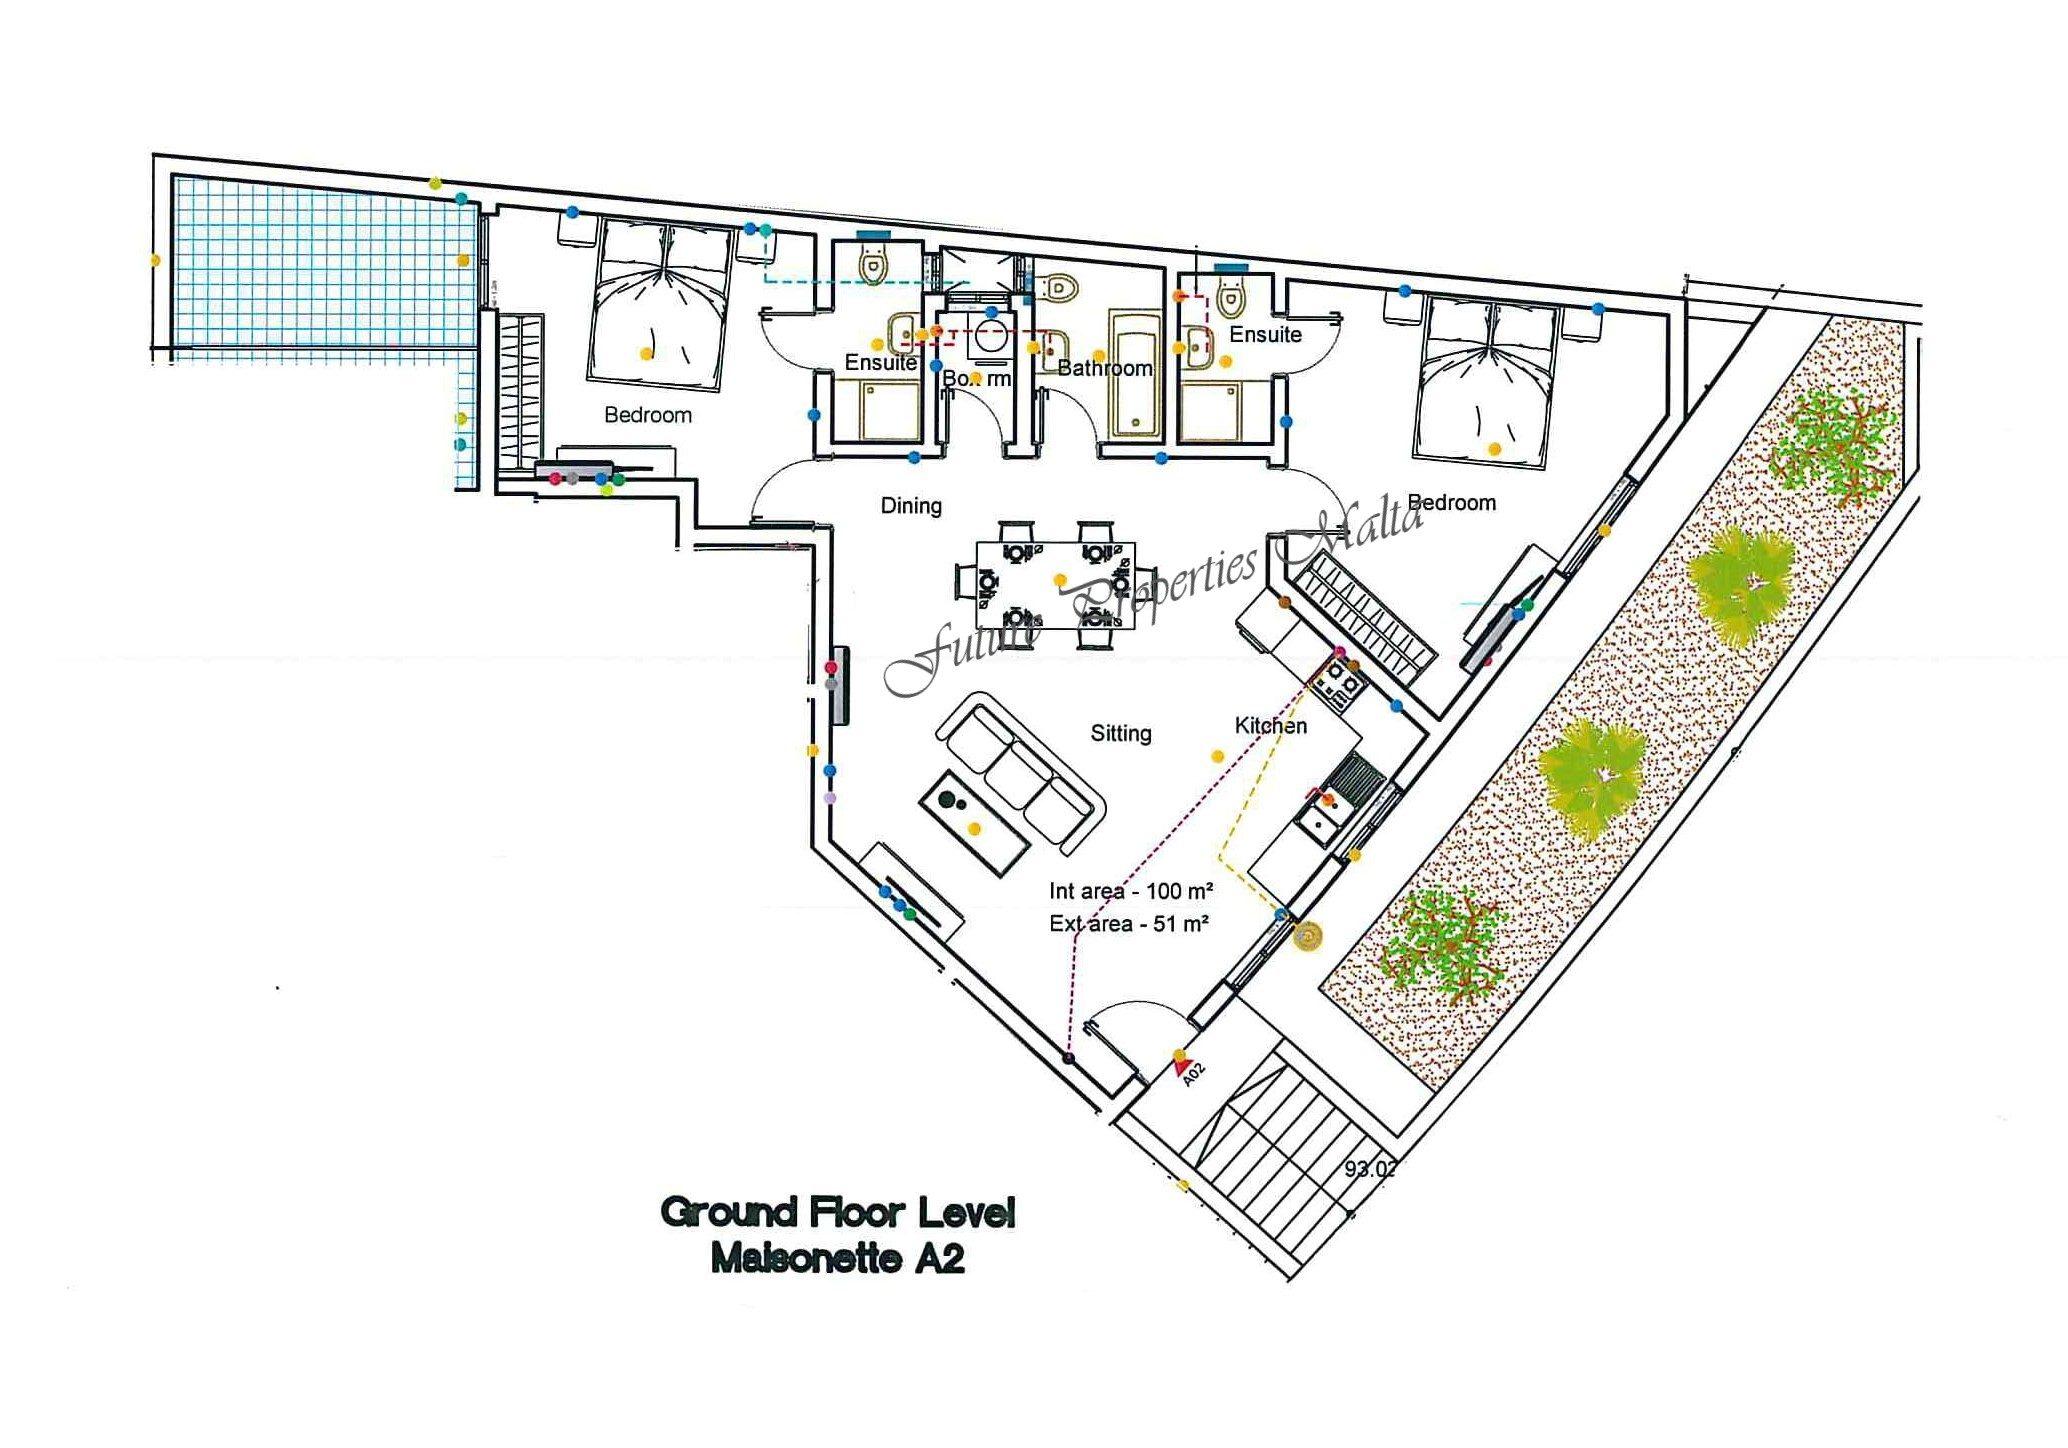 Ground Floor No. 2